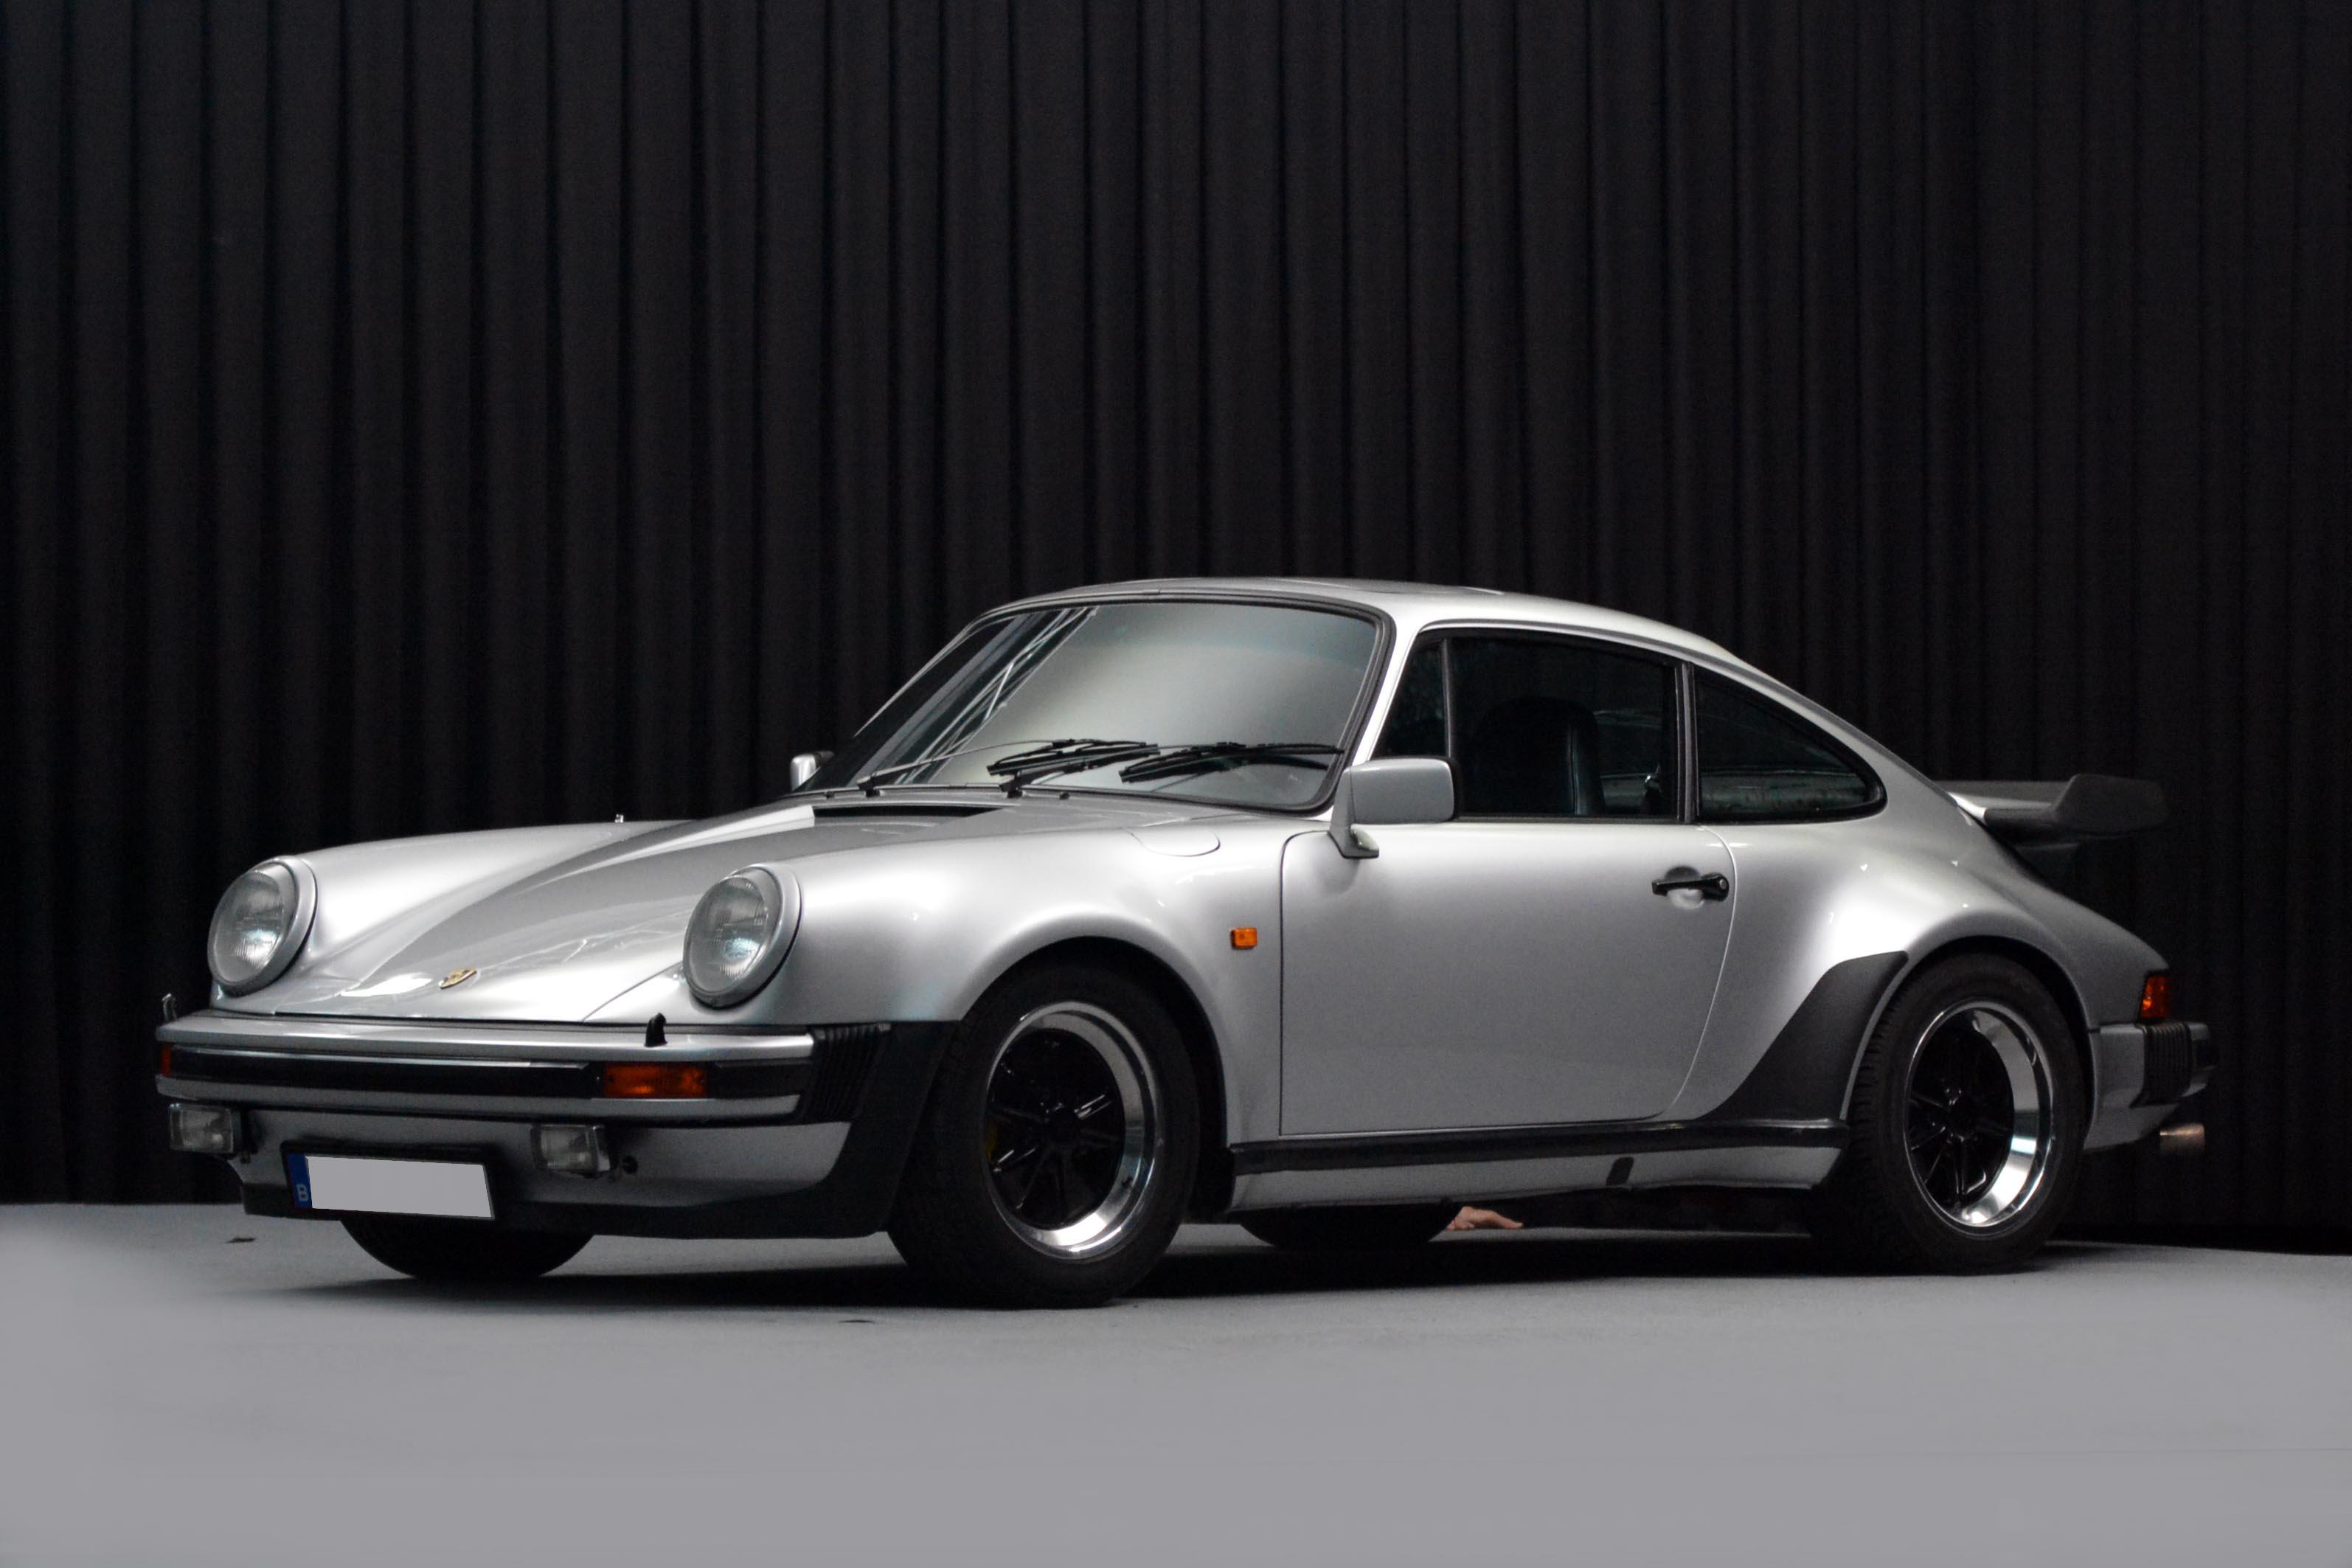 1979 Porsche 911 Quot Turbo Quot 3 3 In Good Condition Fuchs